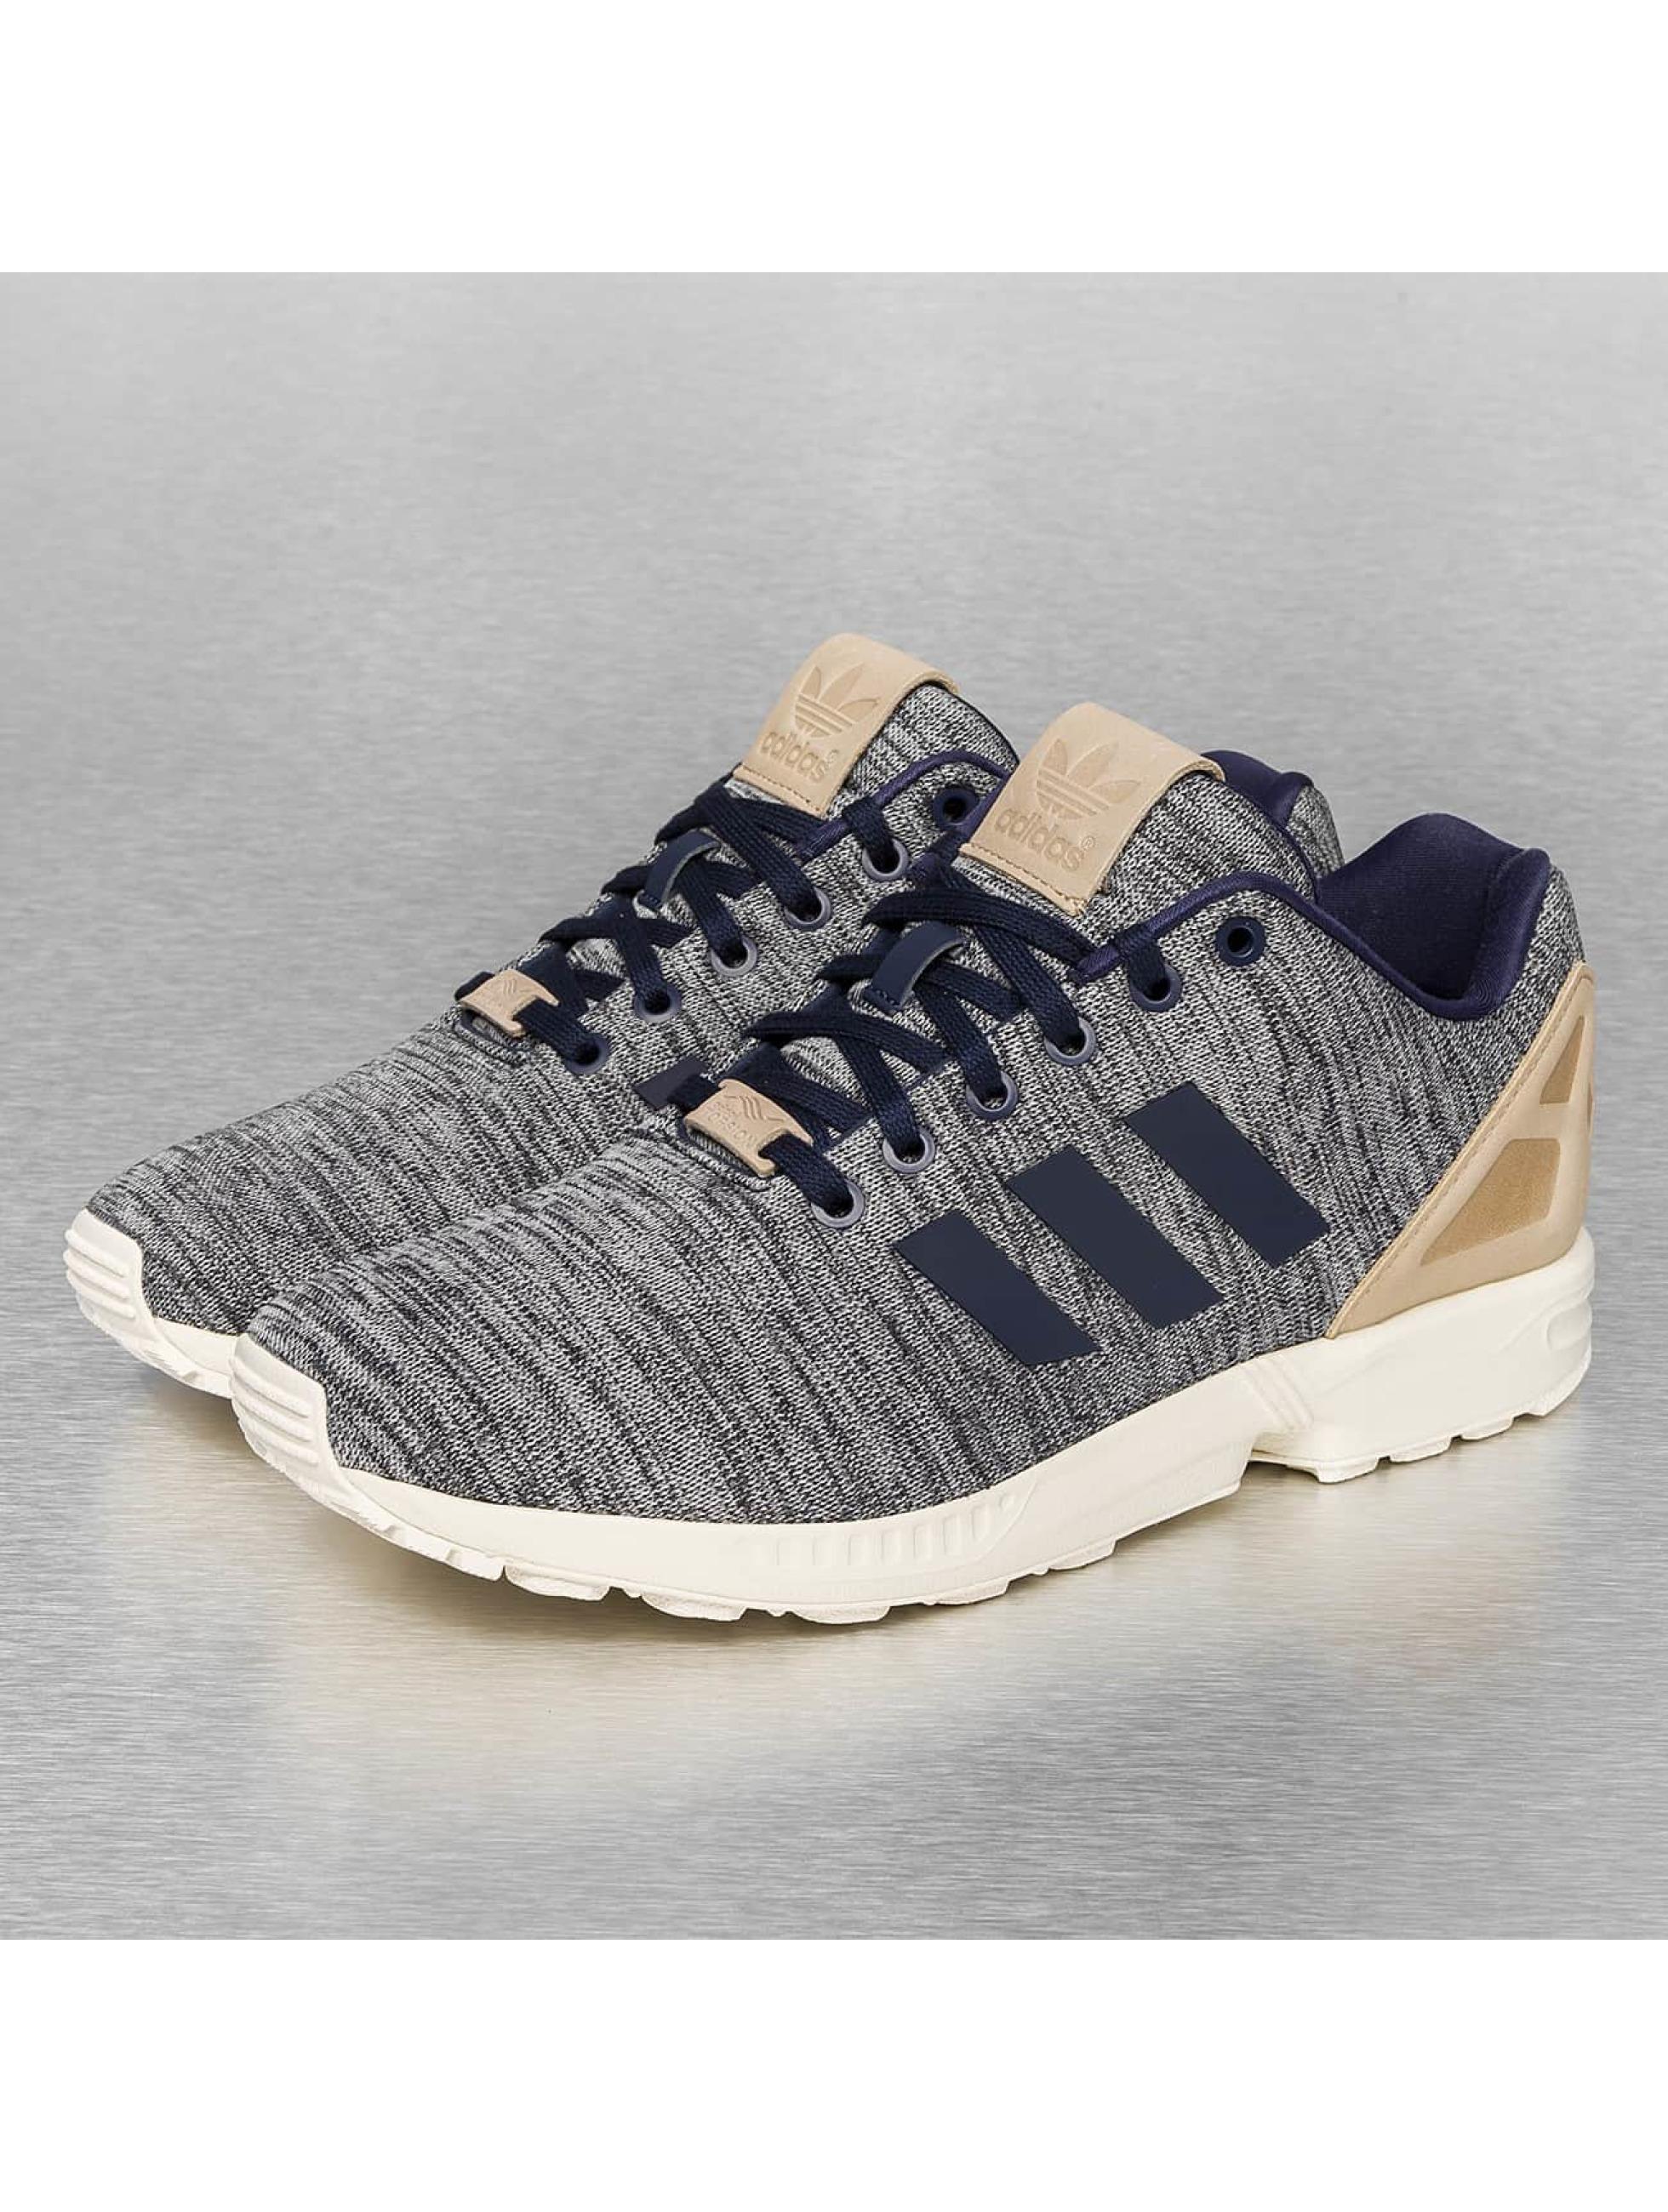 adidas schuhe sneaker zx flux in blau 243329. Black Bedroom Furniture Sets. Home Design Ideas